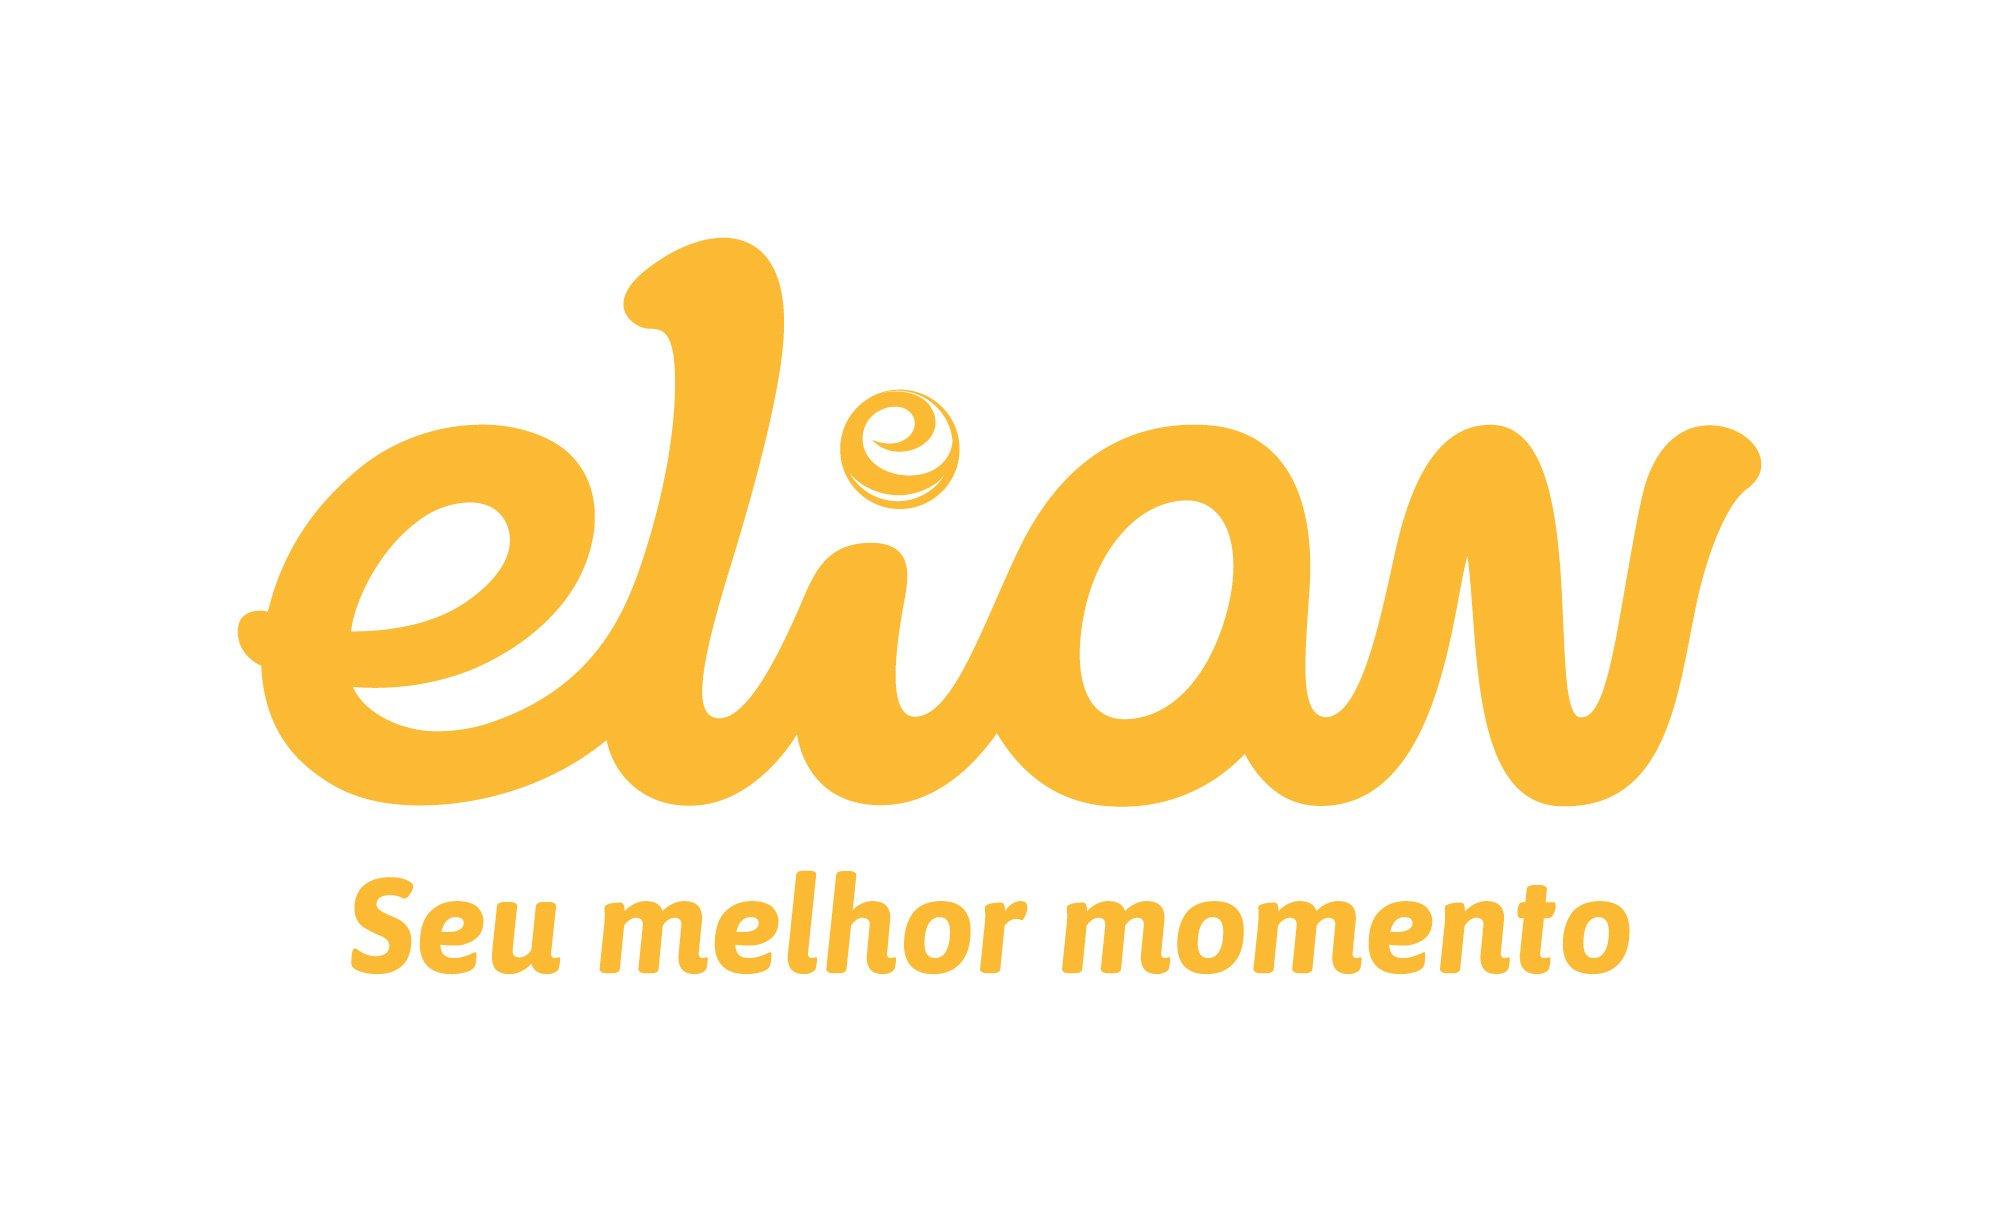 https://0201.nccdn.net/4_2/000/000/01e/20c/2014_logo_elian_seu_melhor_momento-2000x1213.jpg